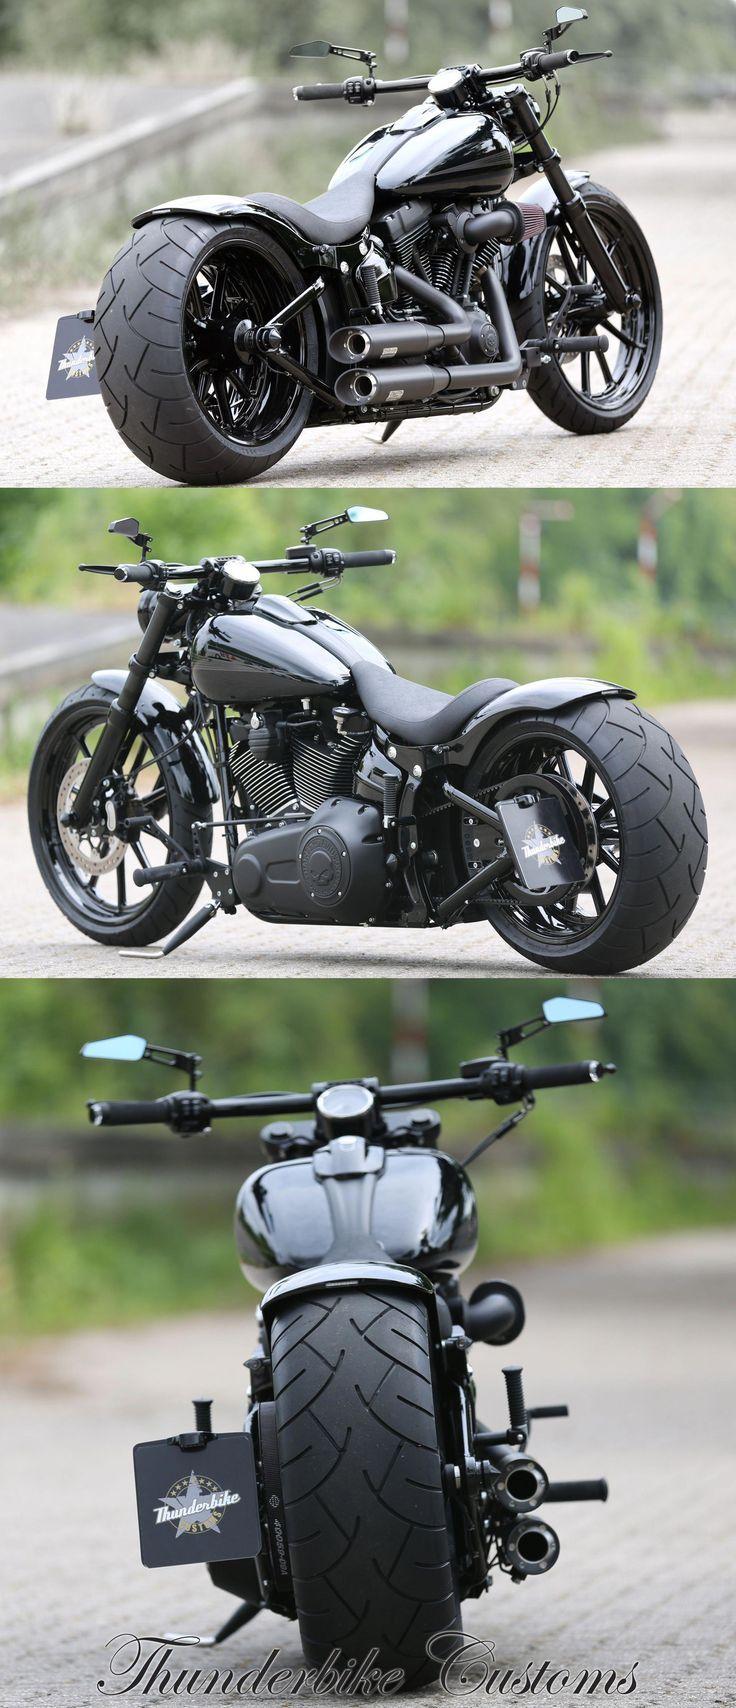 Customized Harley-Davidson Softail Breakout von Thunderbike Customs (Germany) #H…